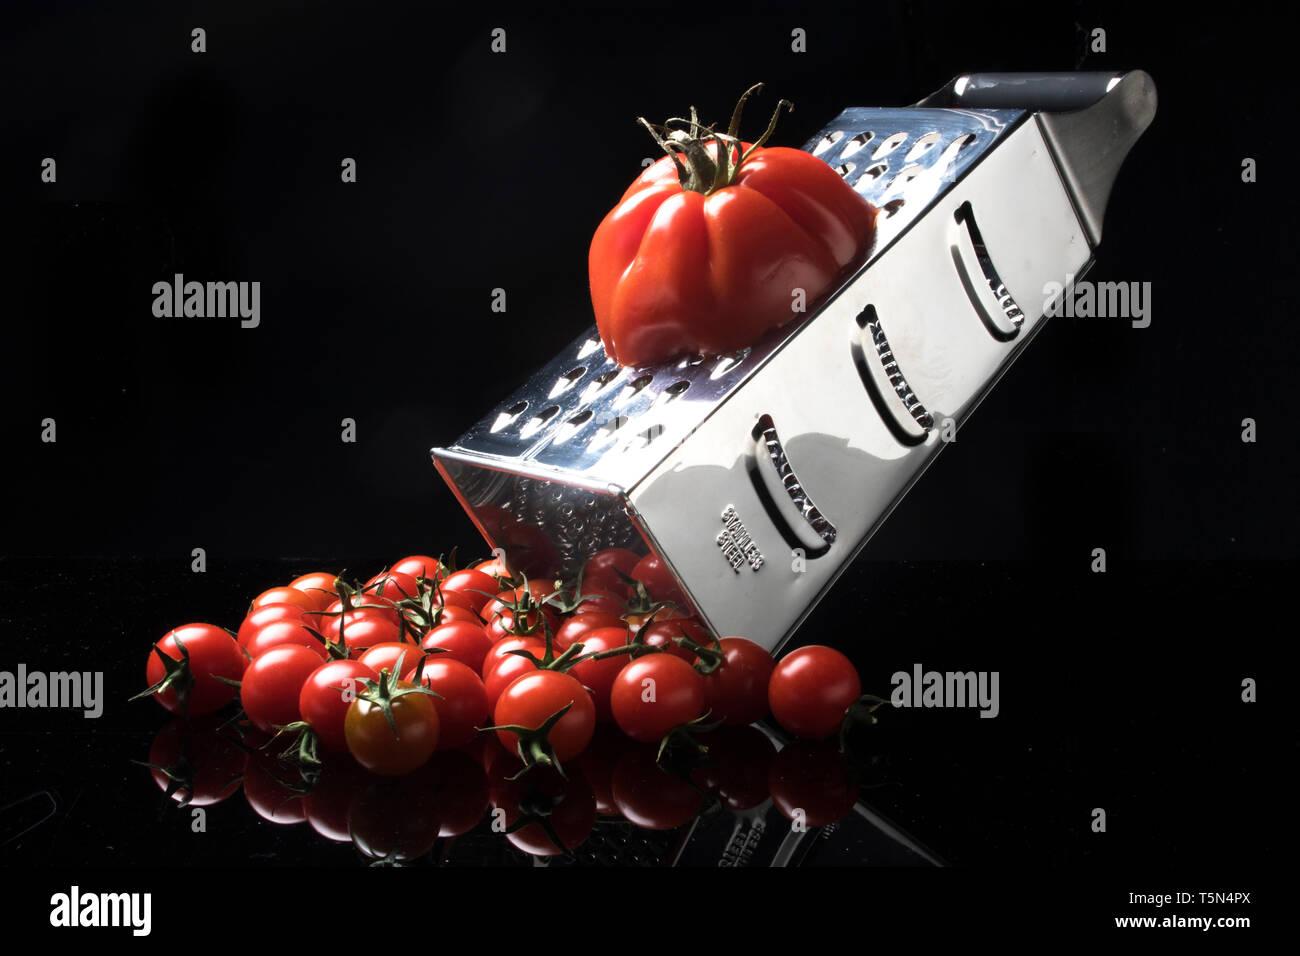 Tomato producing tomato - Stock Image